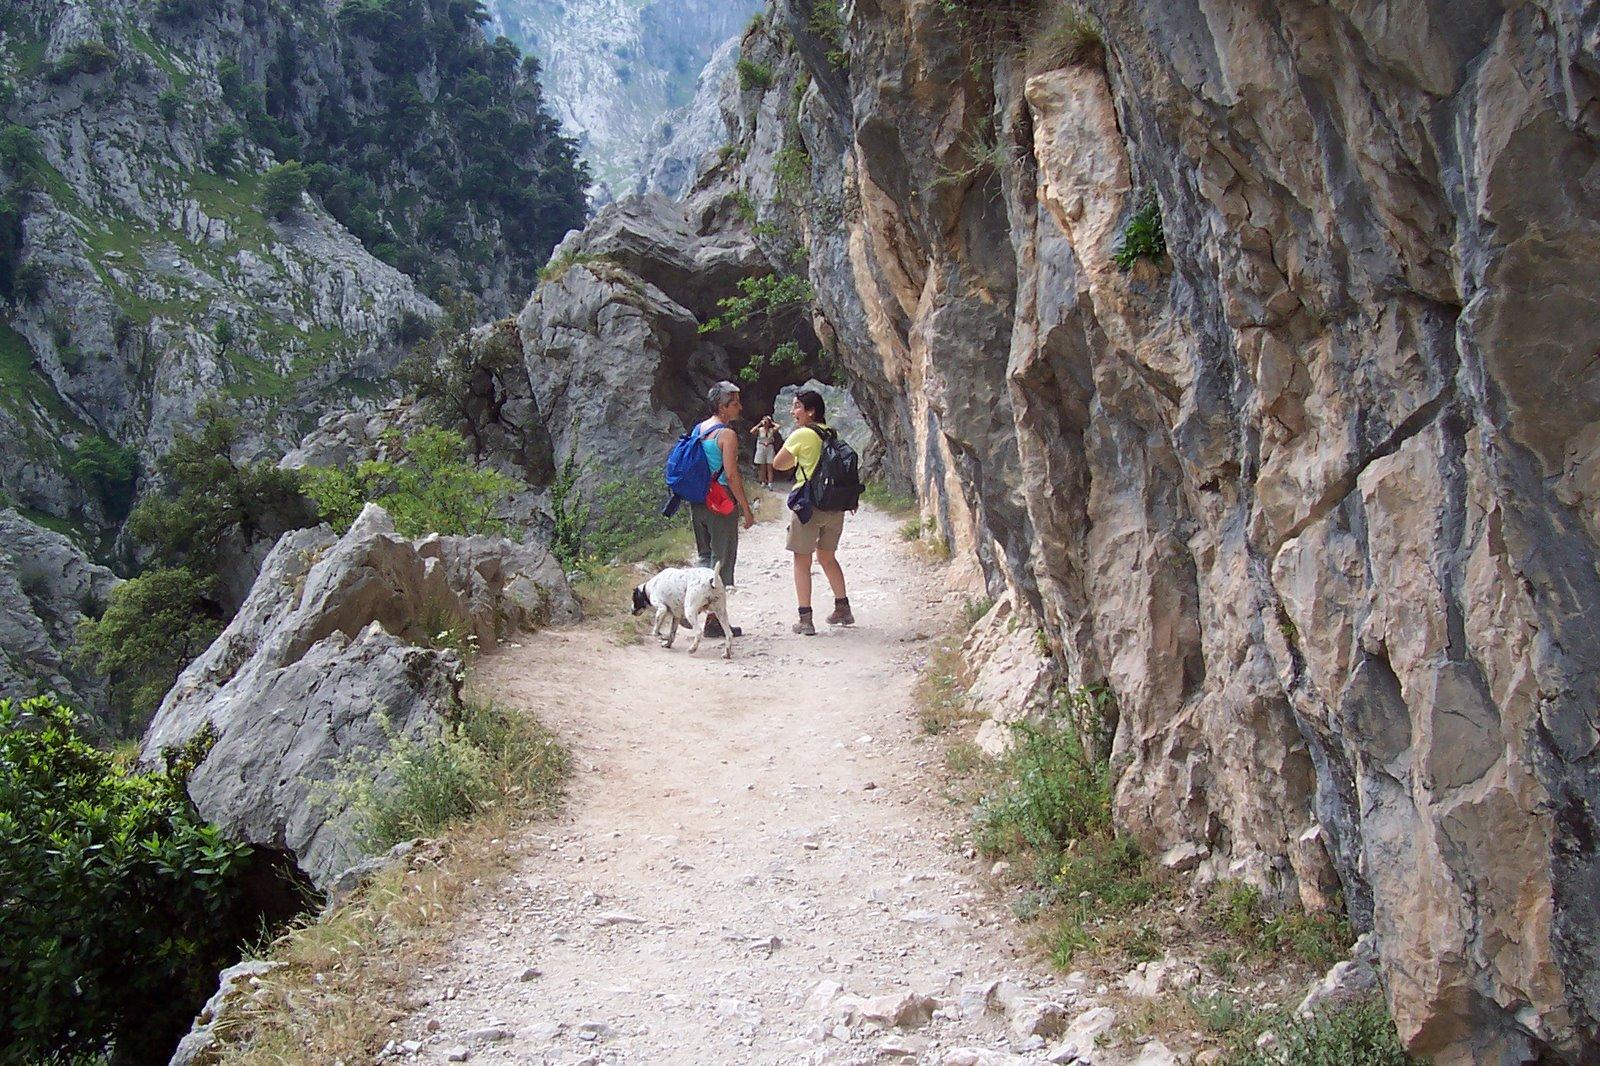 Fuente de la imagen: Almonteconmiperro.blogspot.com